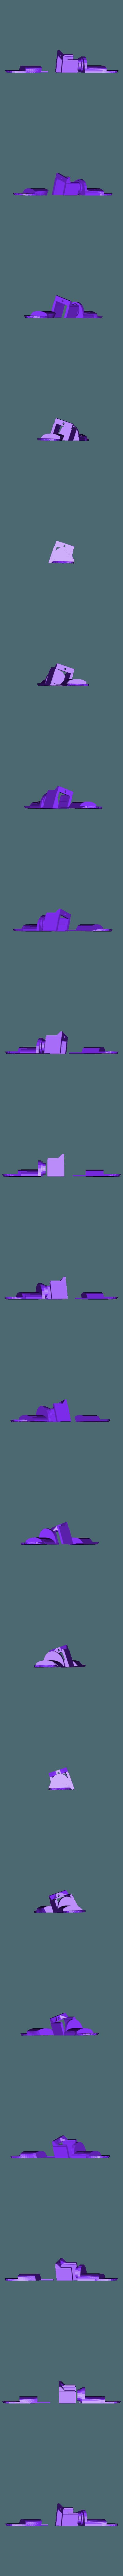 GADGETs head  pt8.stl Download free STL file GADGET the robotic Gremlin • 3D printing object, atarka3